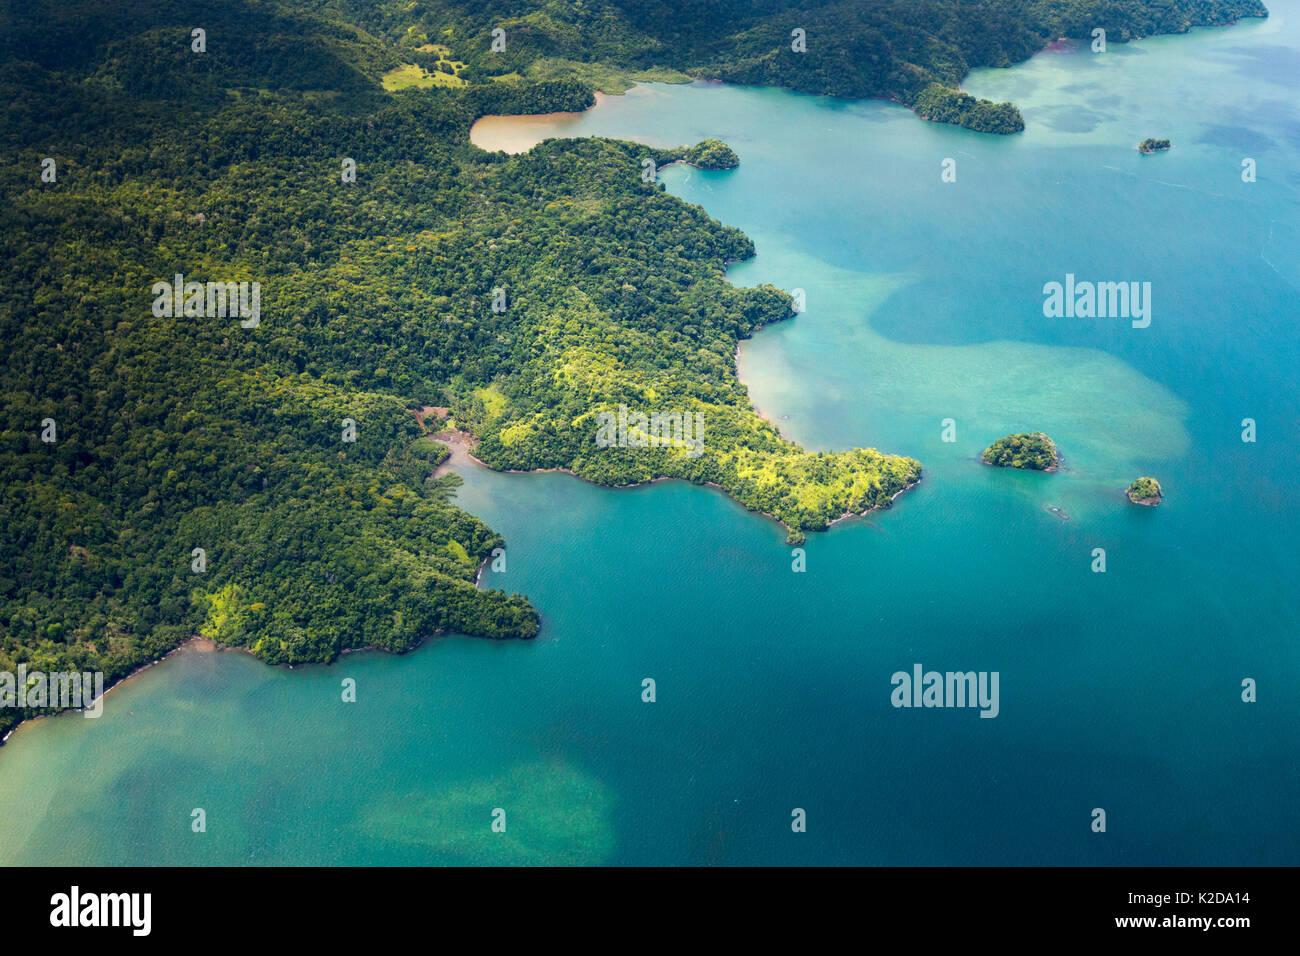 Aerial view of the Osa Peninsula coastline, Costa Rica. - Stock Image